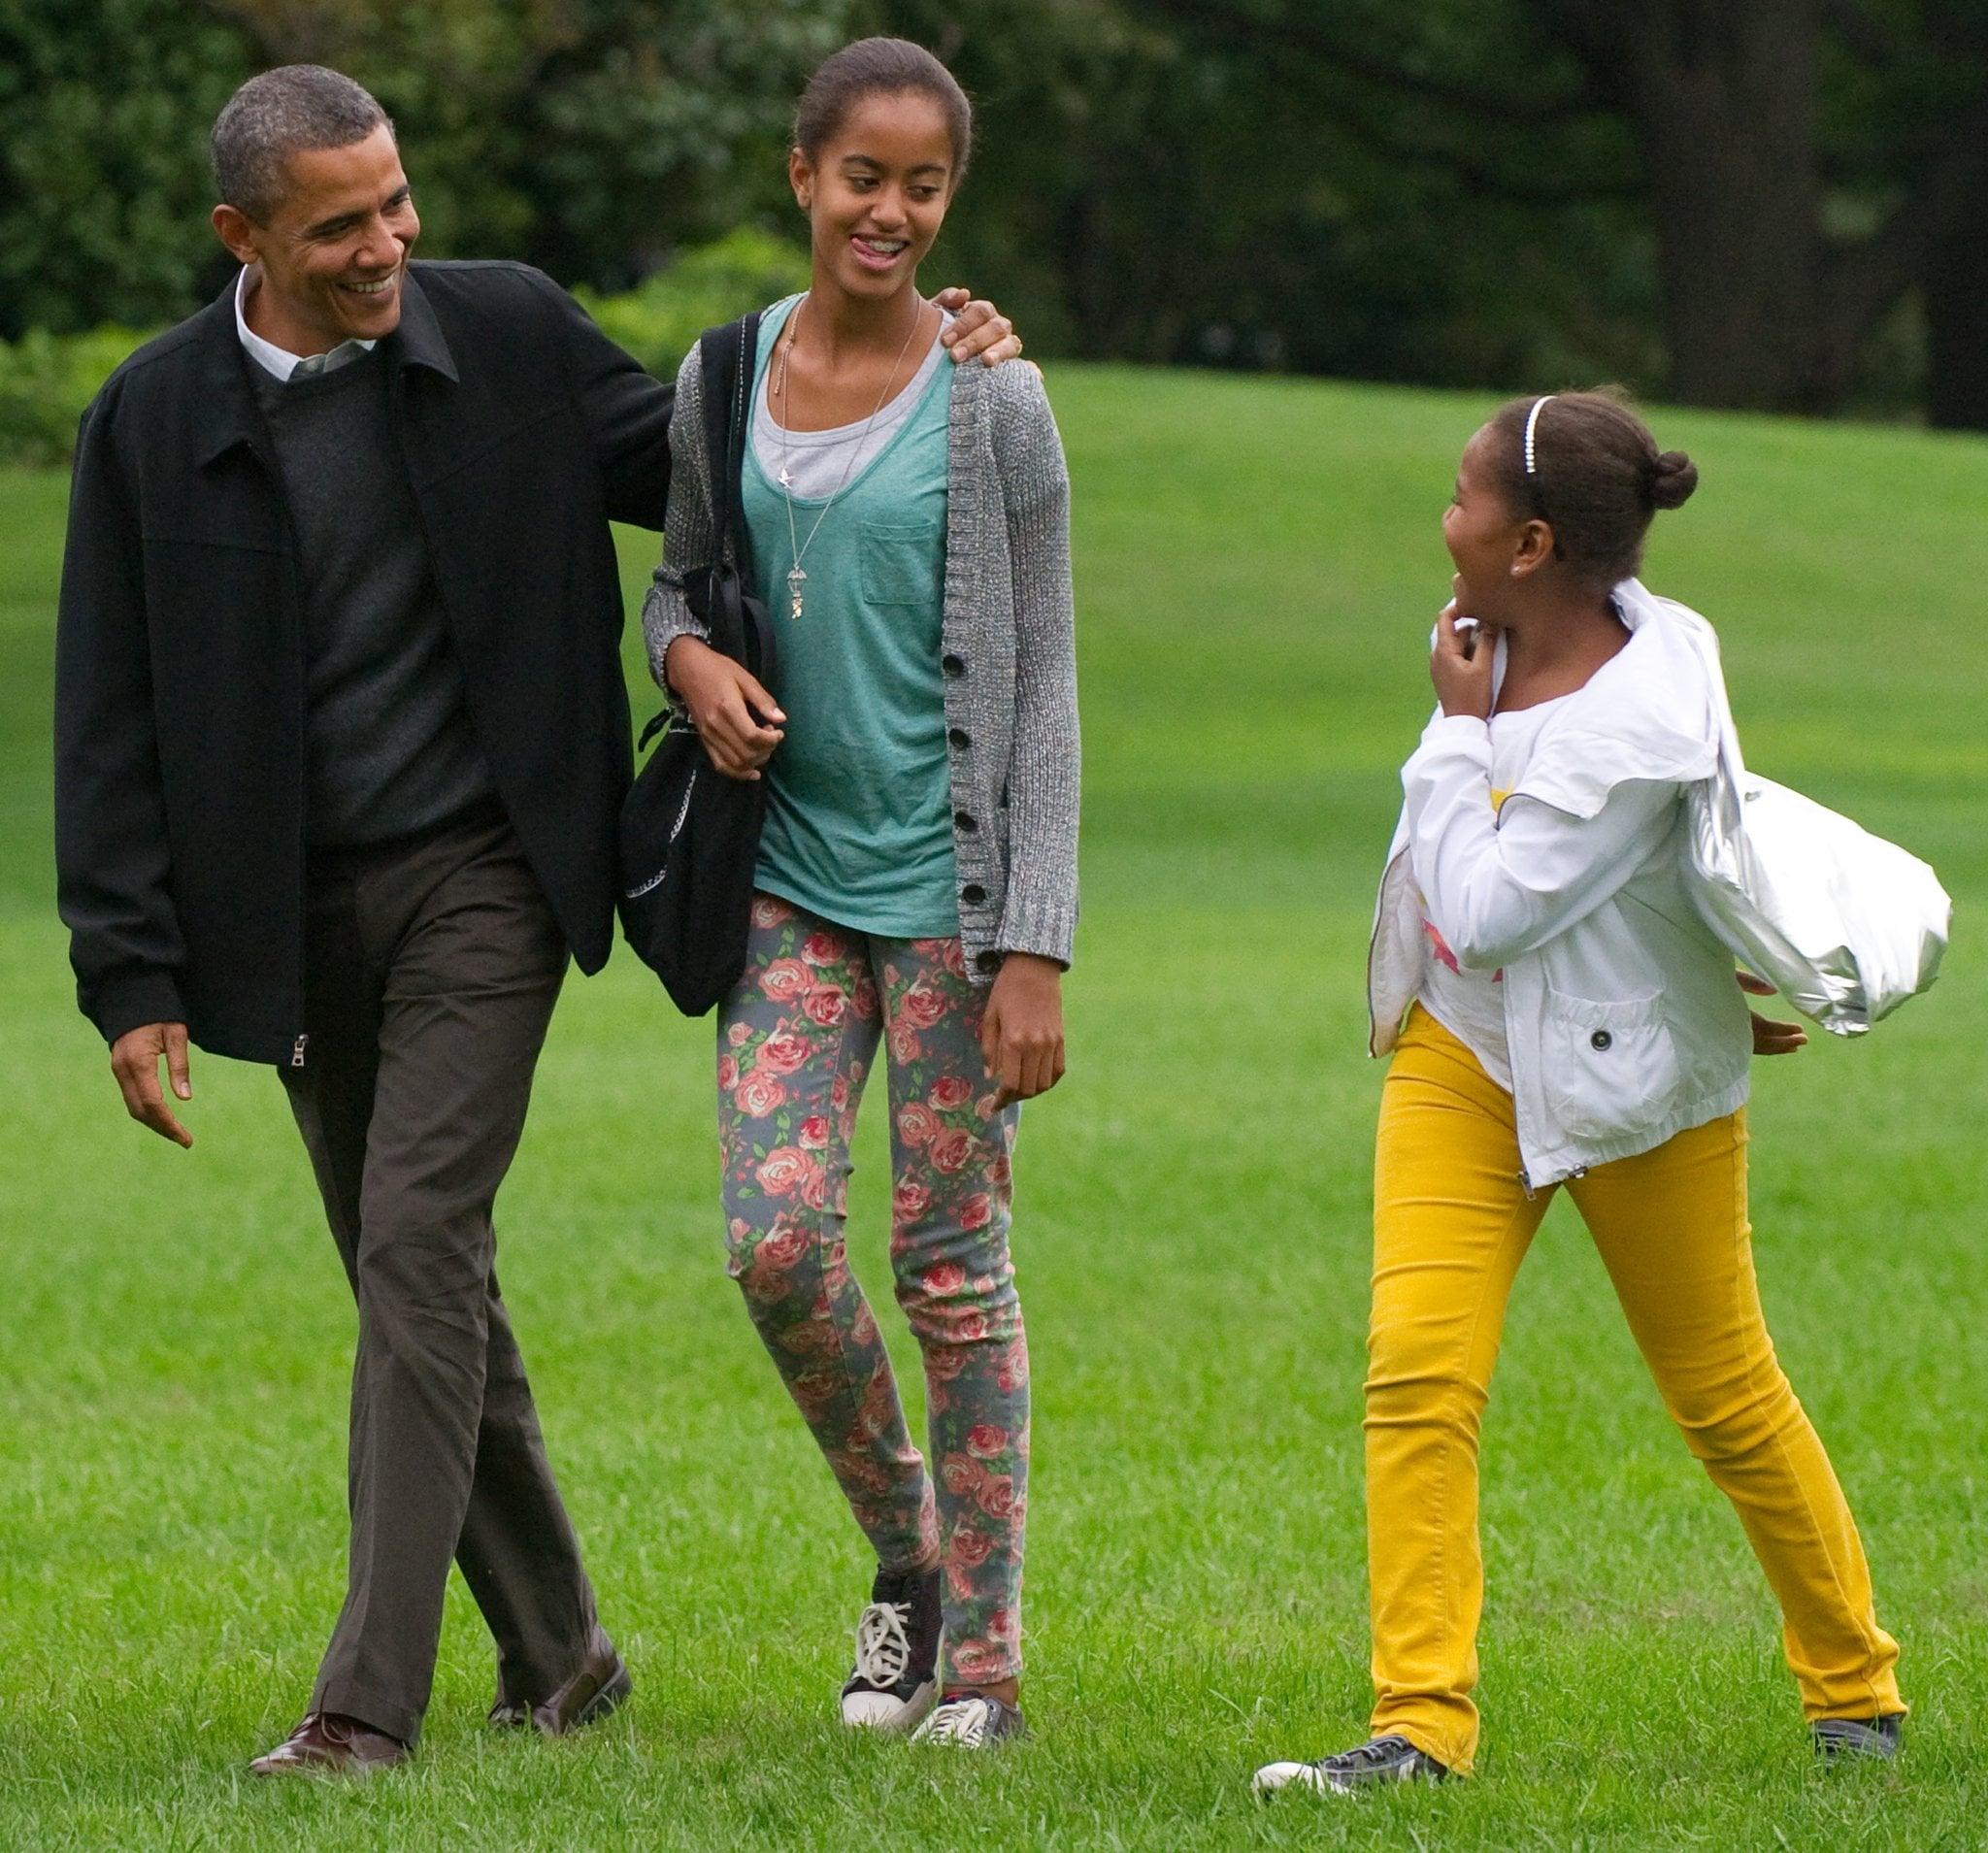 013 33bf4b263c538660 Barack Obama Cute Moments Sasha Malia 1 Essay Marvelous President Research Paper Pdf Michelle Full